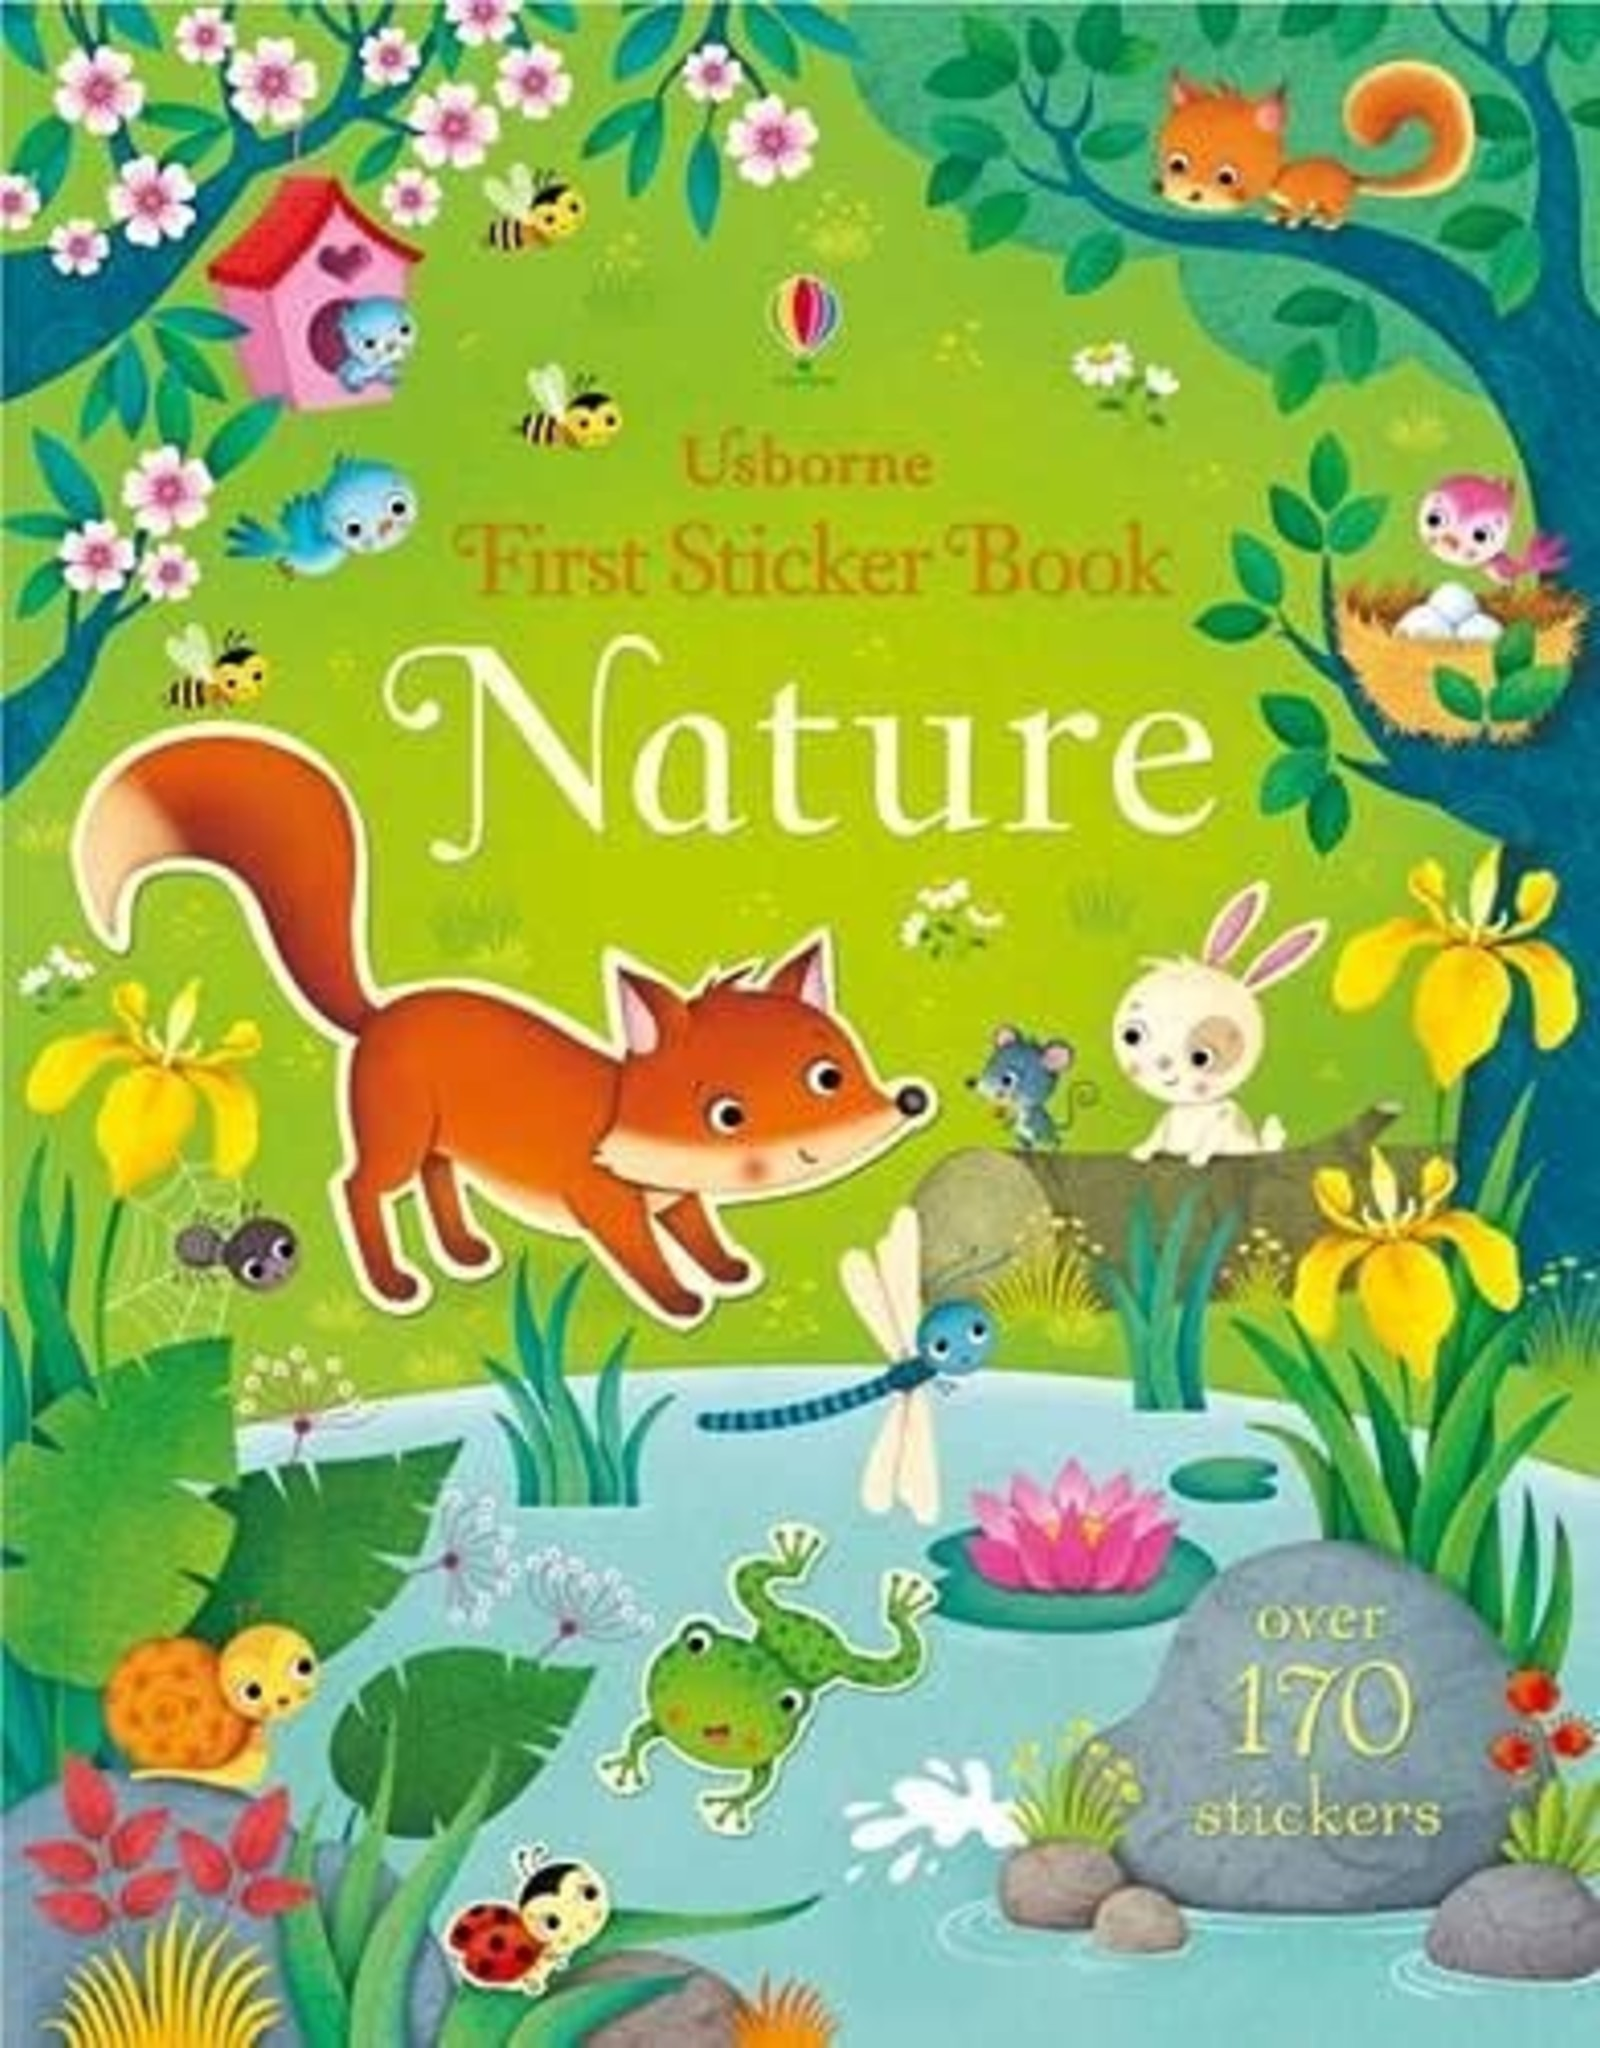 Usborne Usborne First Sticker Book: Nature